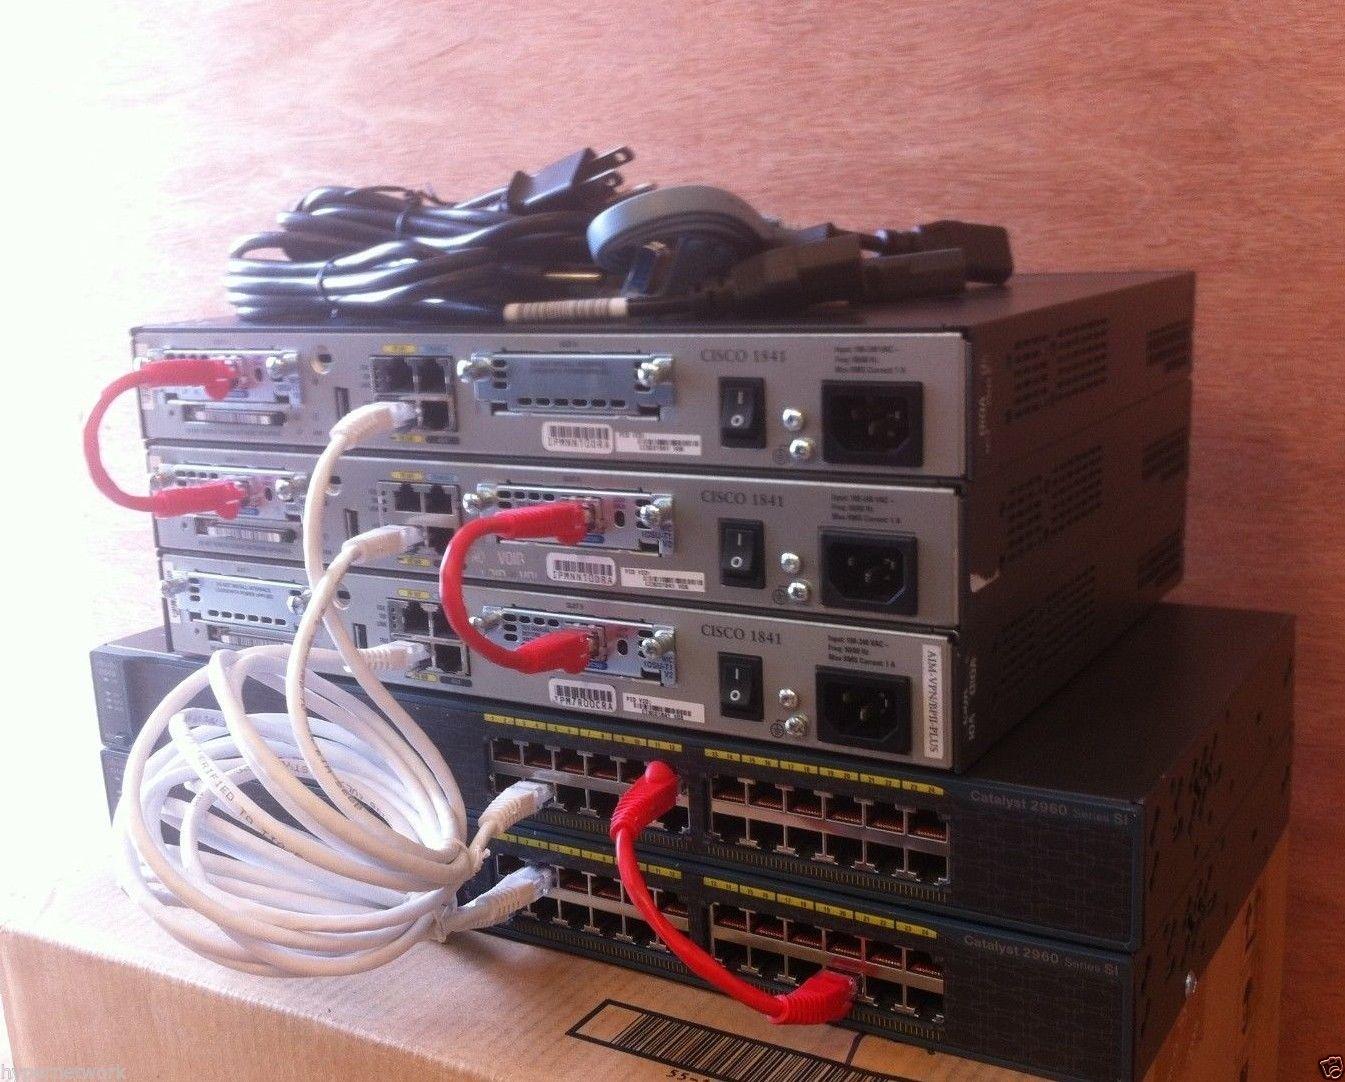 Cisco CCENT CCNA CCNP CCIE R&S LAB 3x 1841 IOS 15 1T 2x 2960-24 IOS